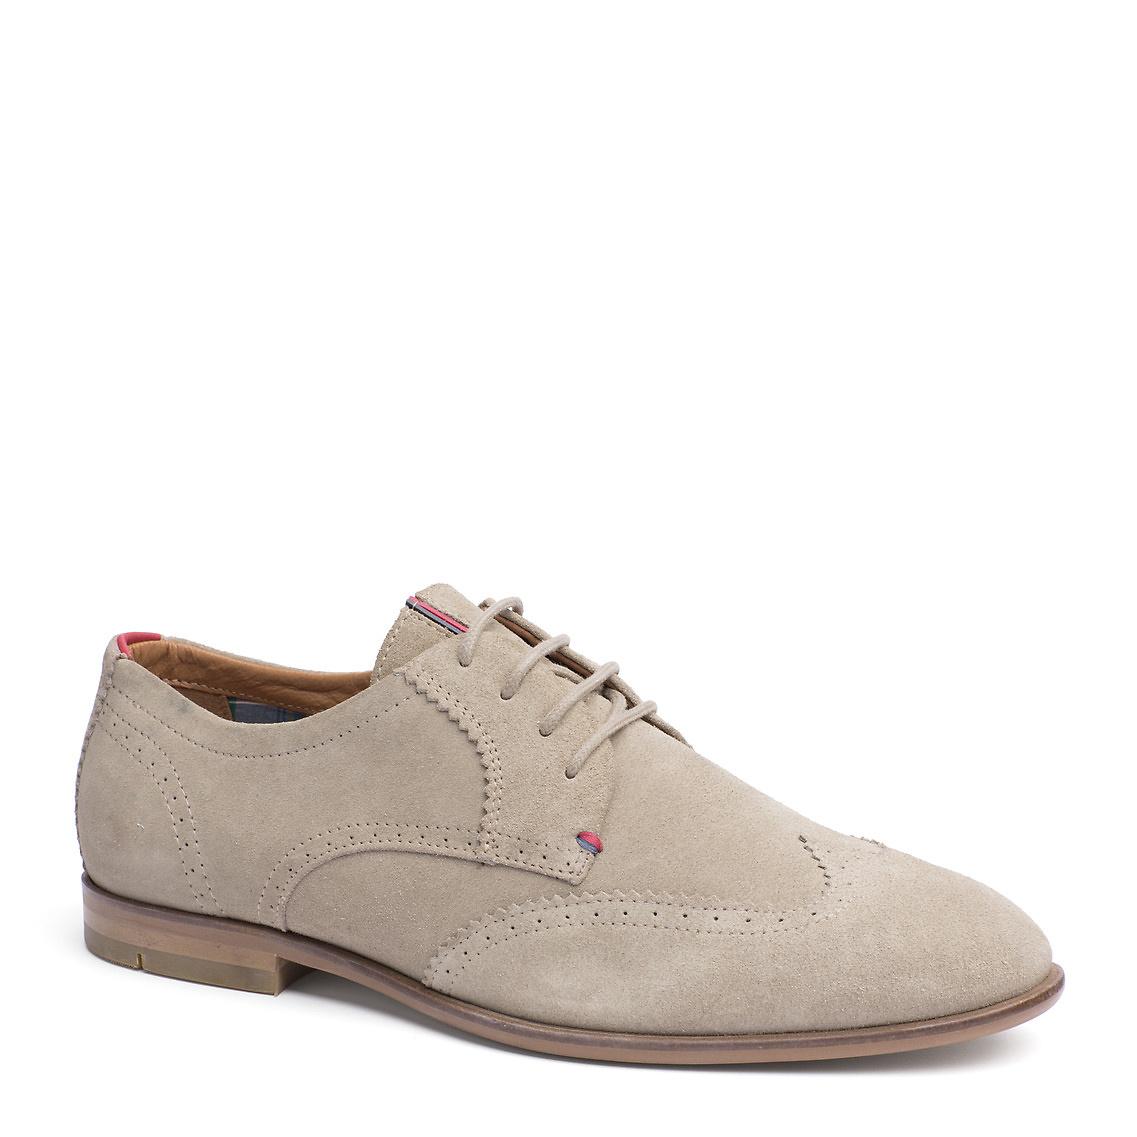 Tommy Hilfiger Dalton Dress Shoe